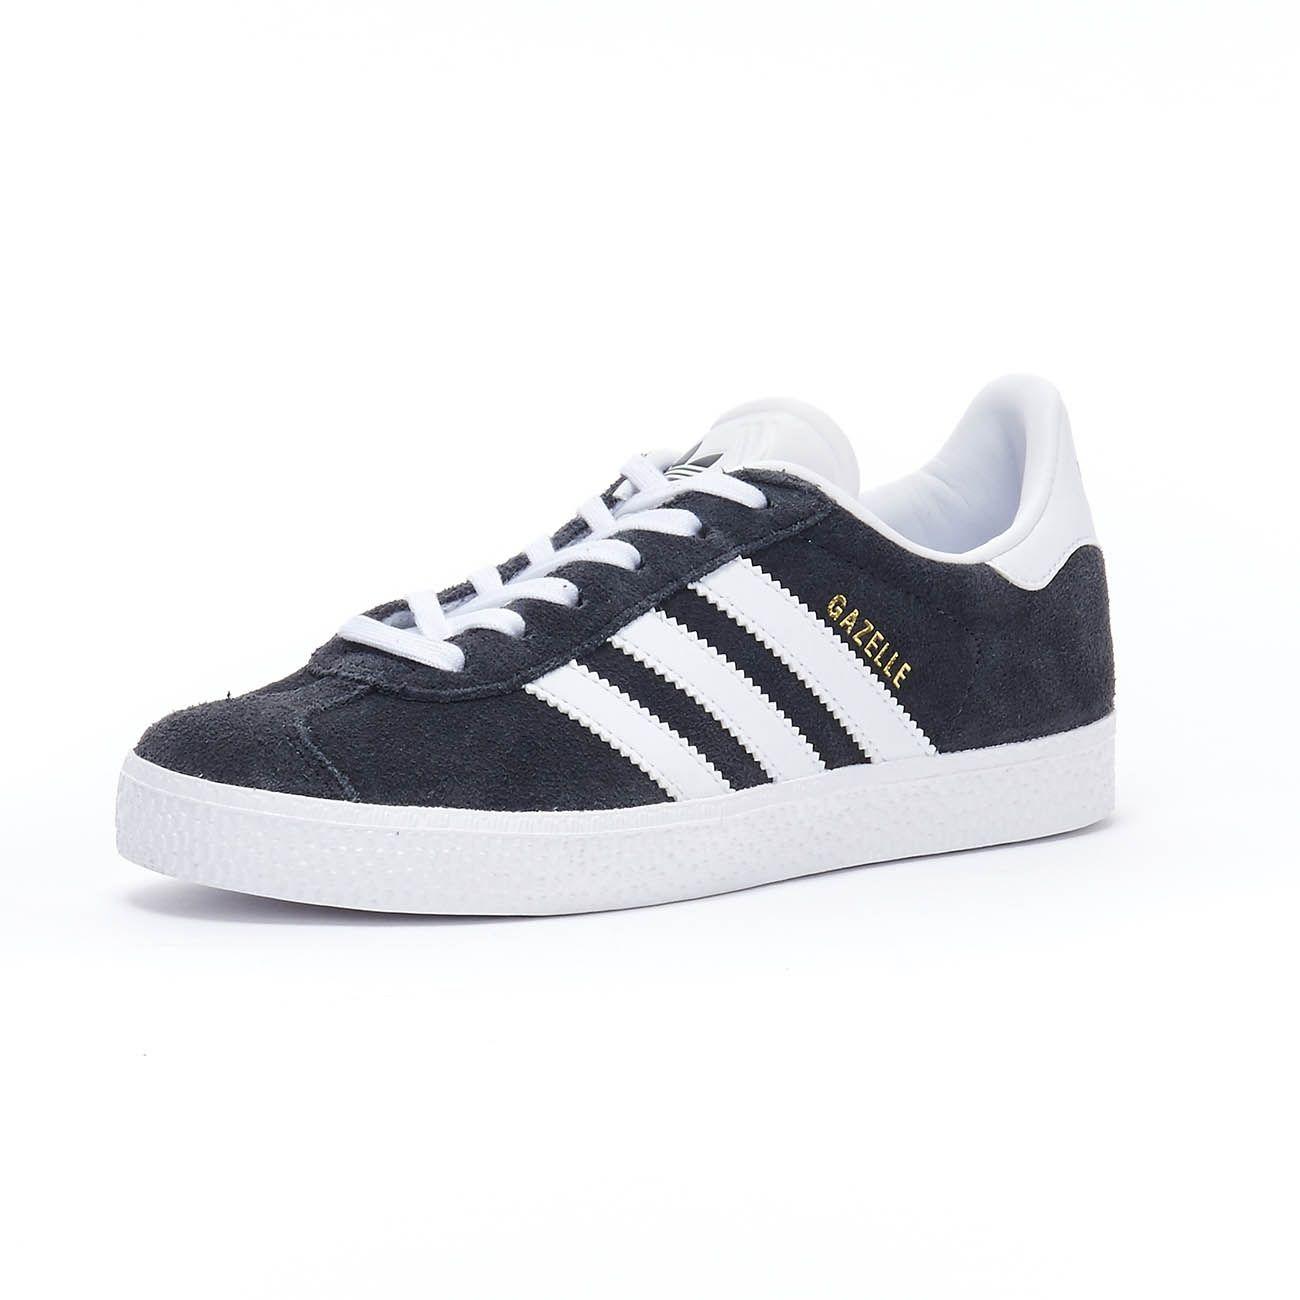 ADIDAS GAZELLE C SNEAKERS Kid Dark grey white   Mascheroni Sportswear